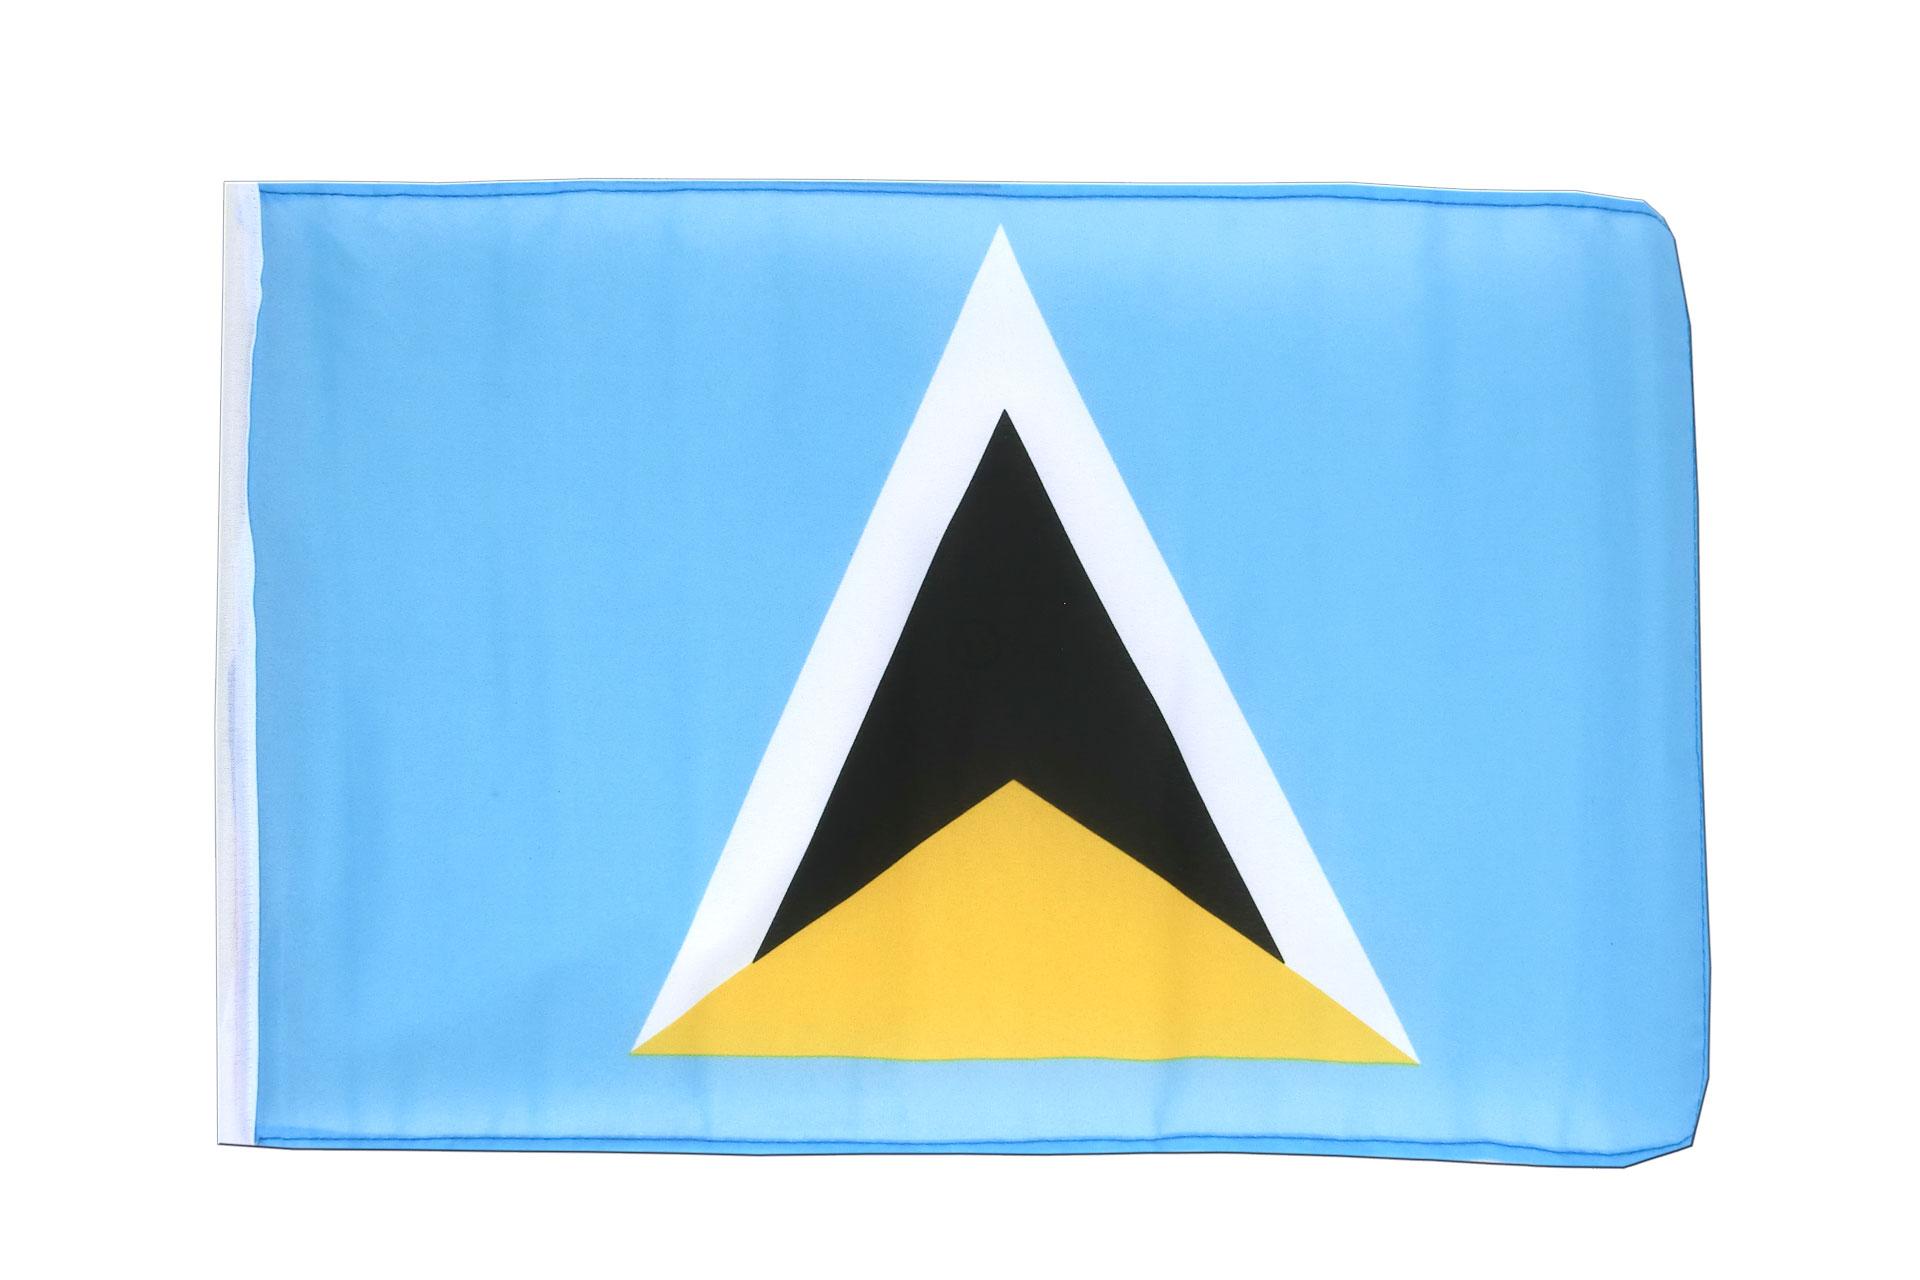 kleine st lucia fahne lucianische flagge 30 x 45 cm. Black Bedroom Furniture Sets. Home Design Ideas